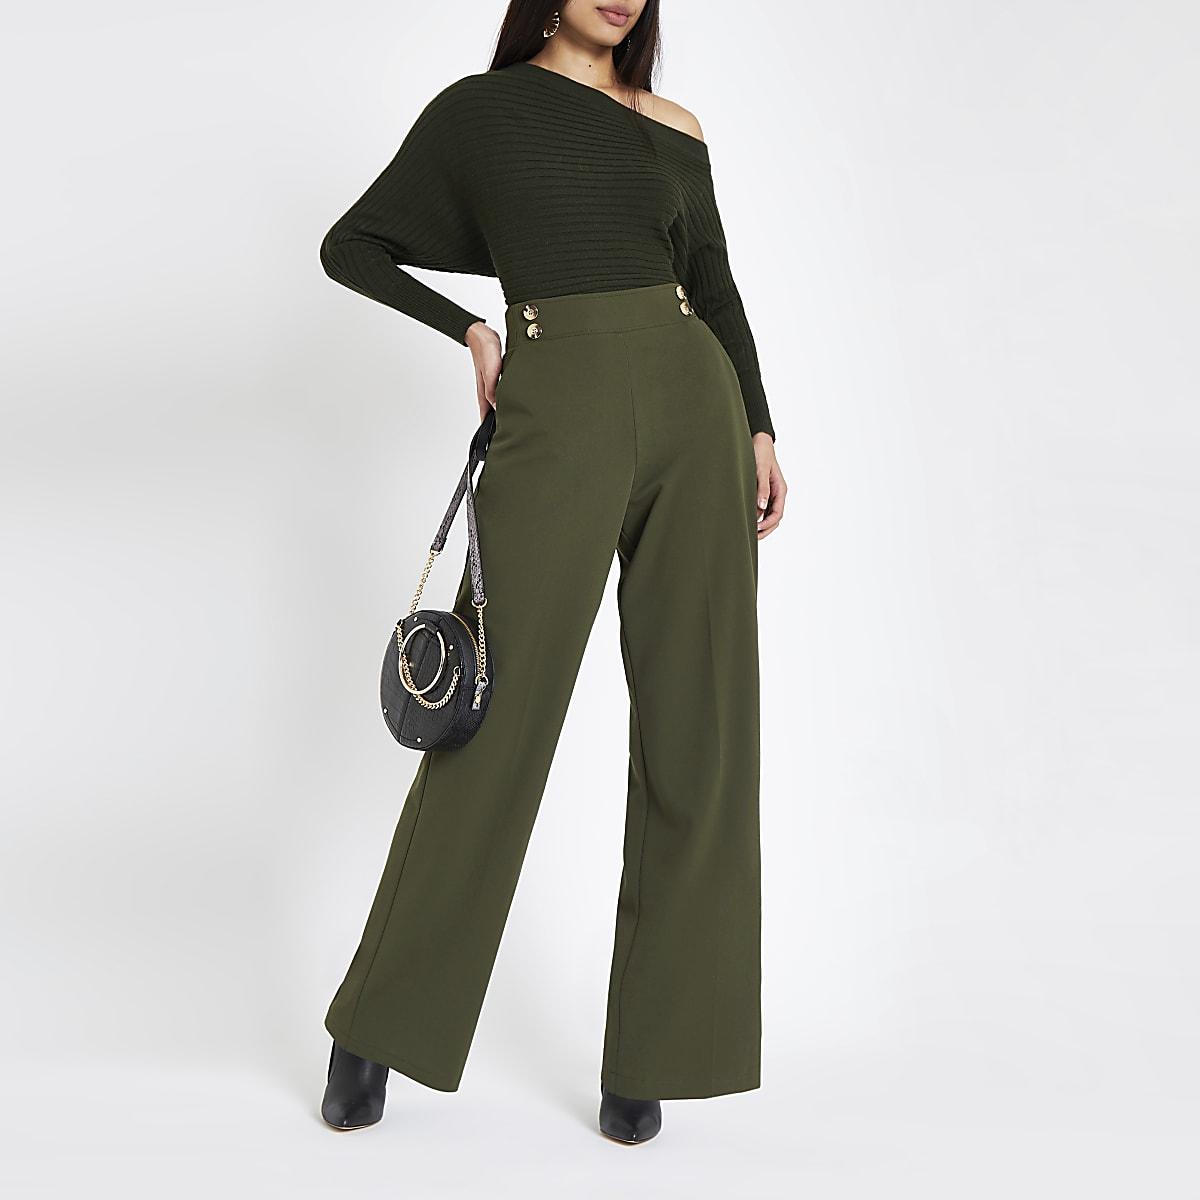 Khaki double button wide leg pull on pants